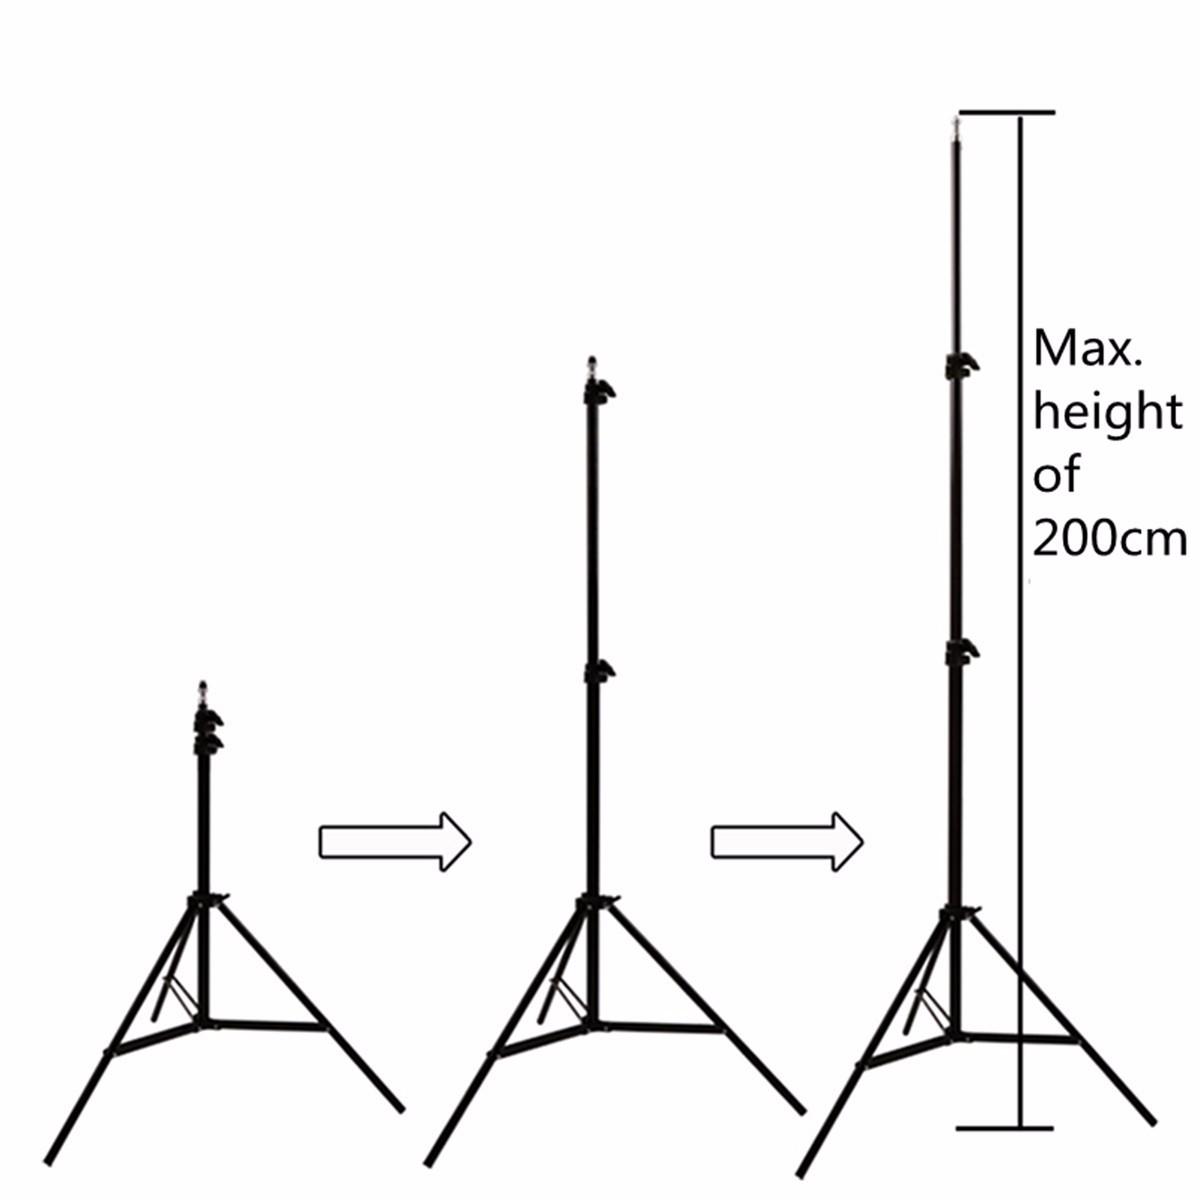 hight resolution of 2pcs professional portable photo 2m 7ft light stand camera tripod lighting kit